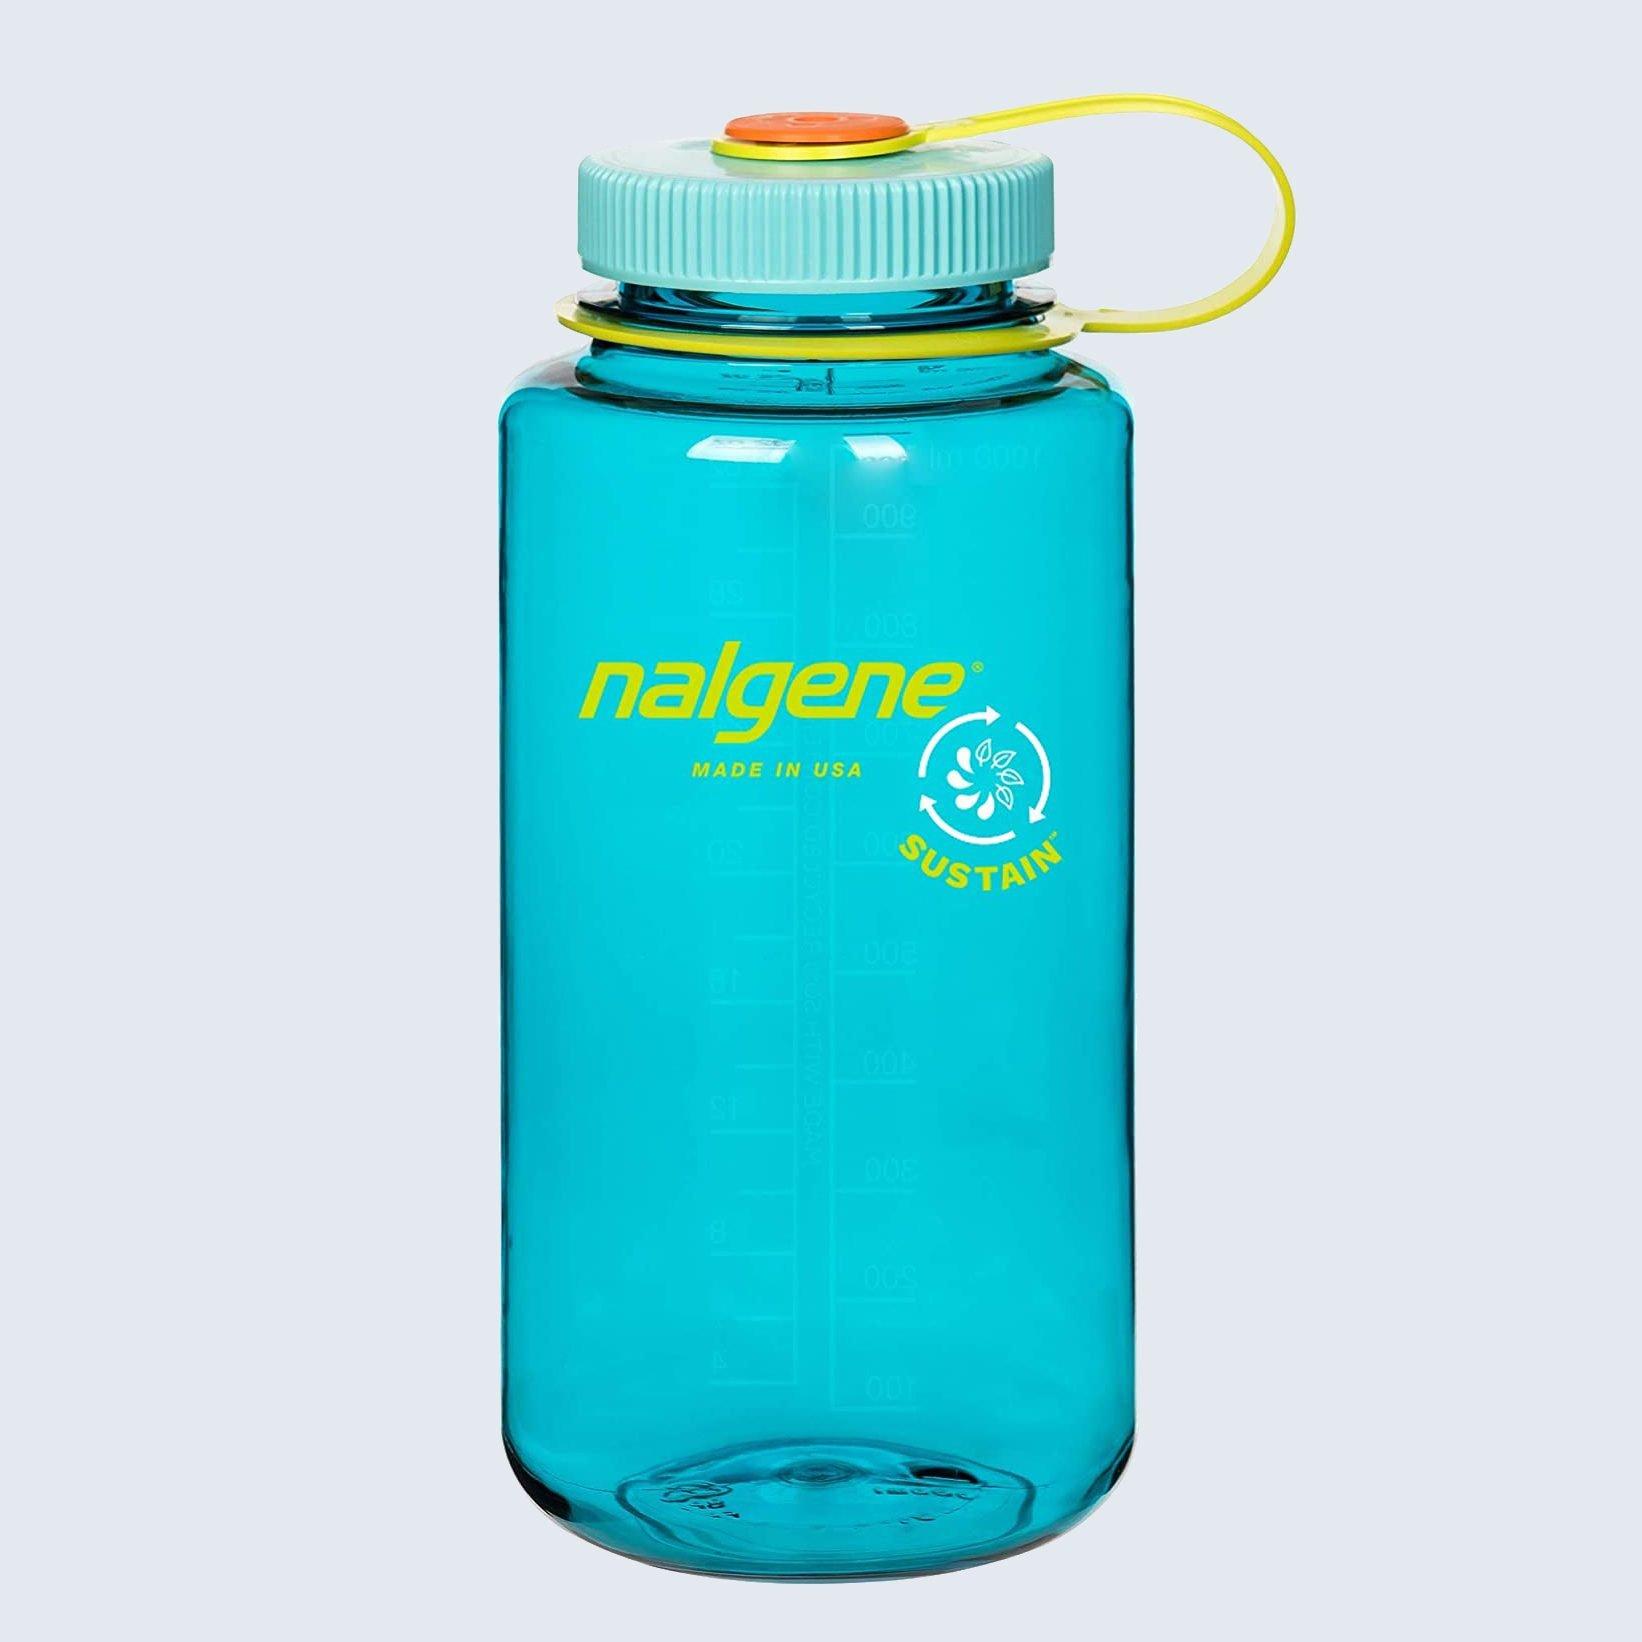 Nalgene Sustain Tritan Water Bottle